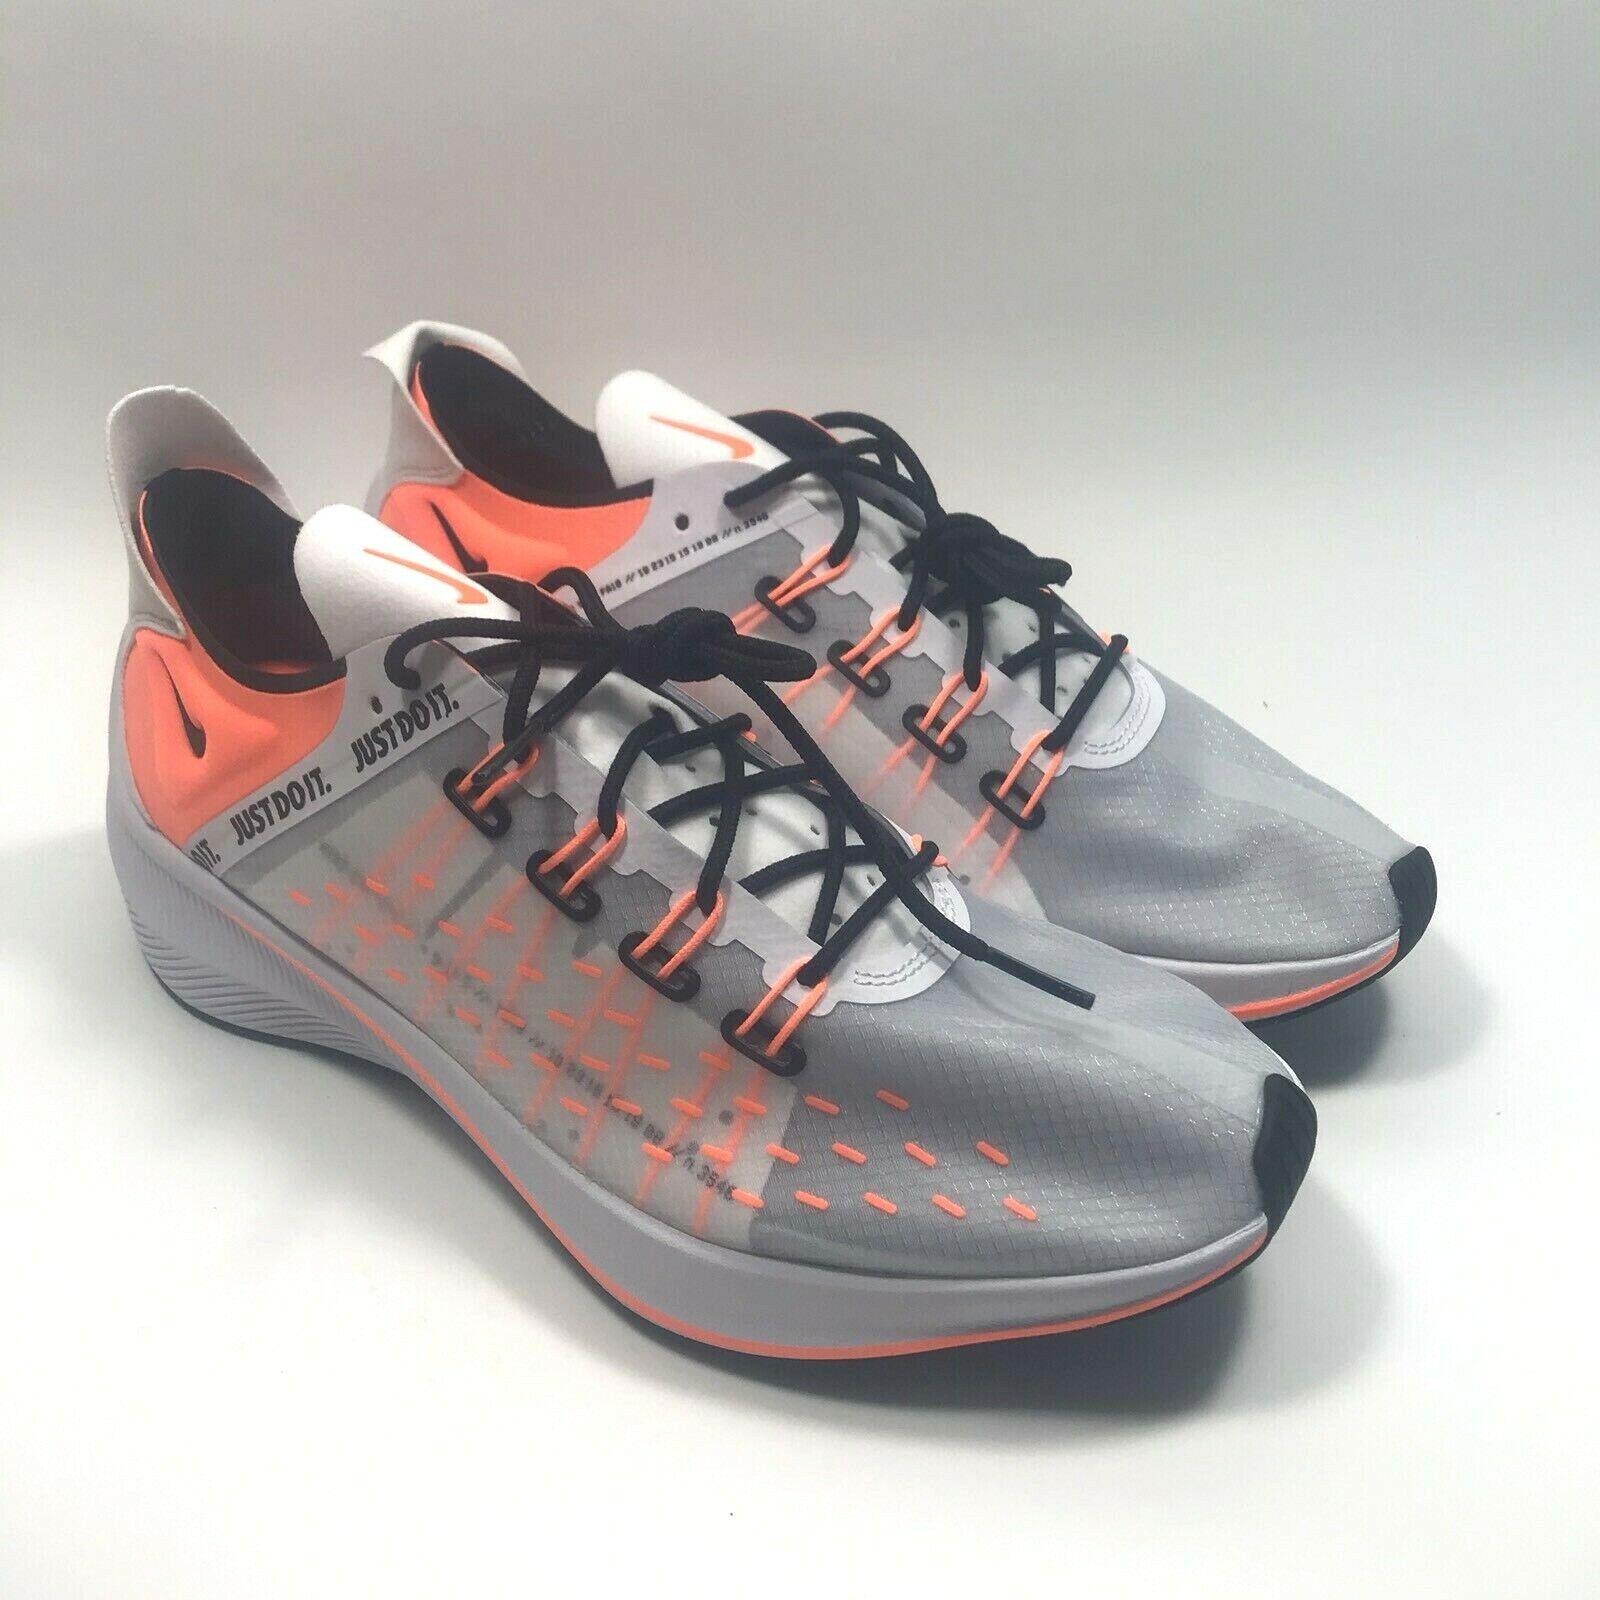 Nike EXP-X14 SE Just Do It White orange Black Running shoes AO3095-100 SZ 9-10.5